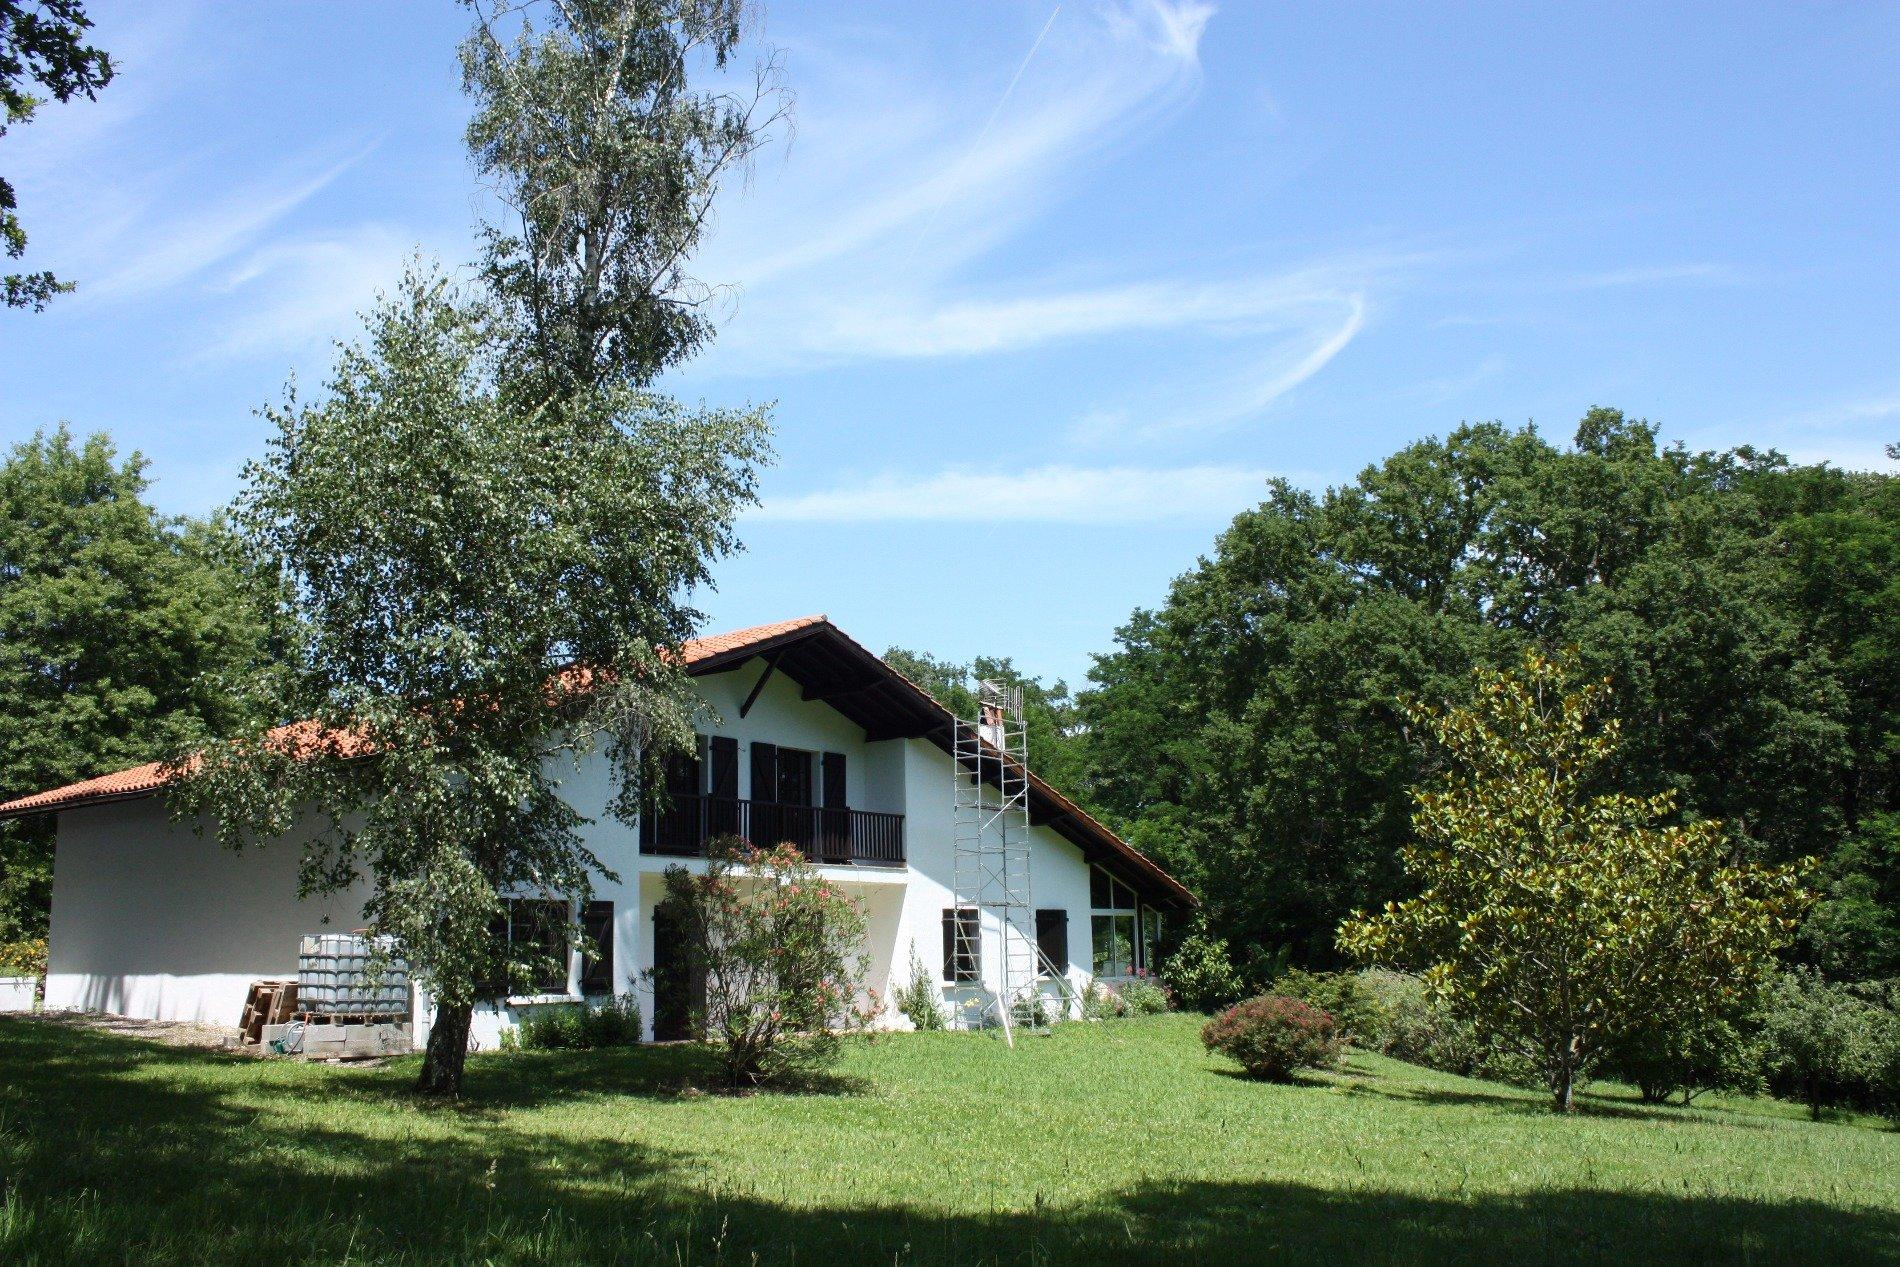 Maison a vendre a 5 min de bayonne terres oc an for Acheter maison hossegor